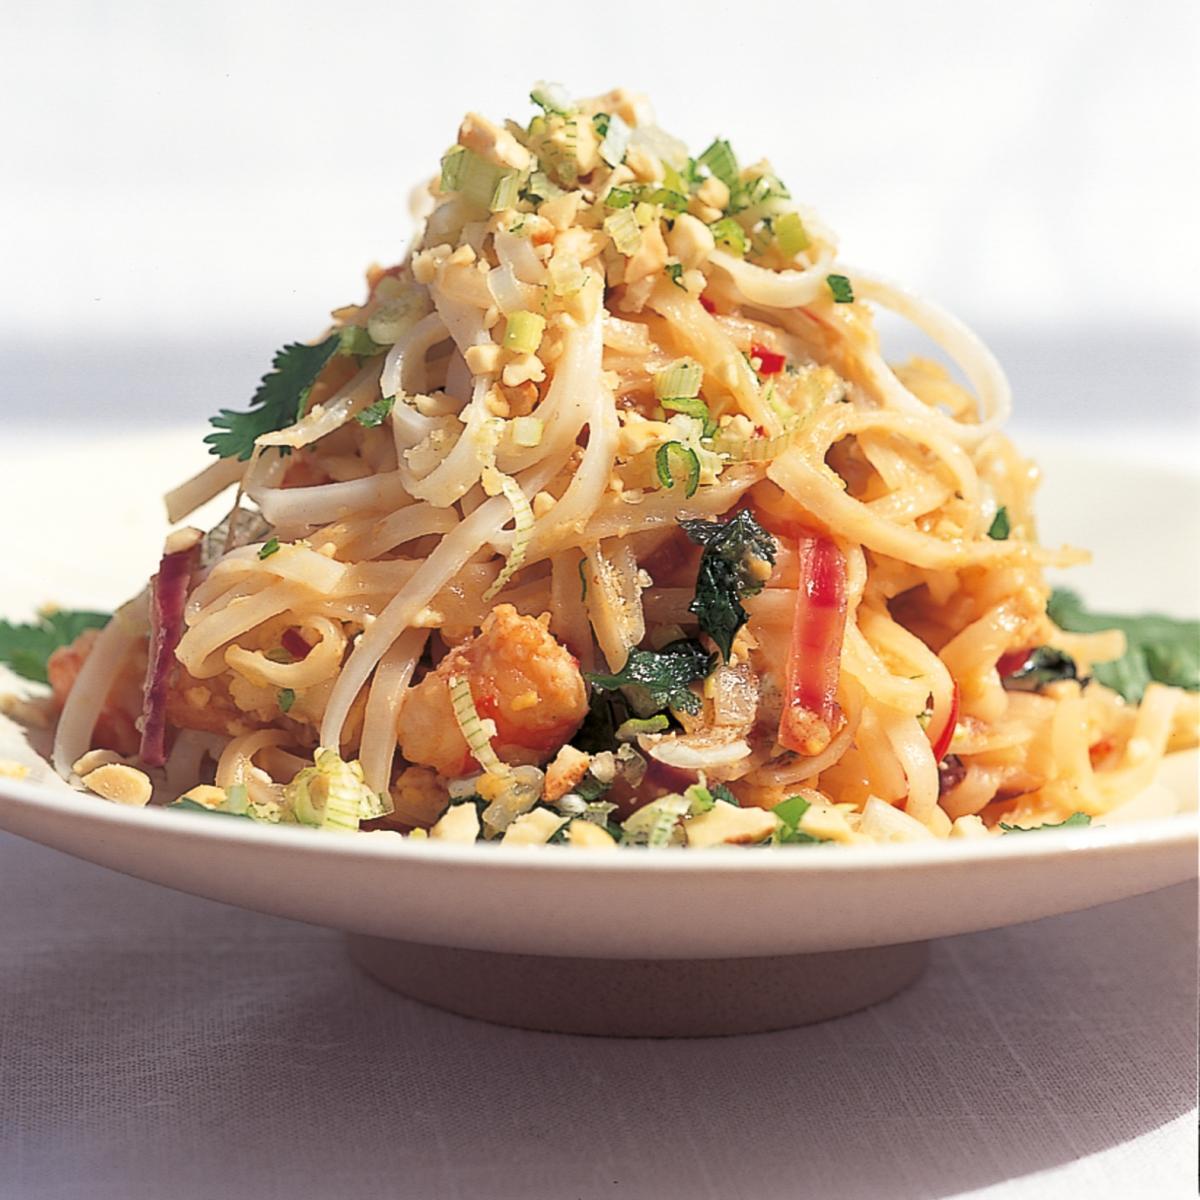 A picture of Delia's Pad Thai Noodles with Shrimps recipe